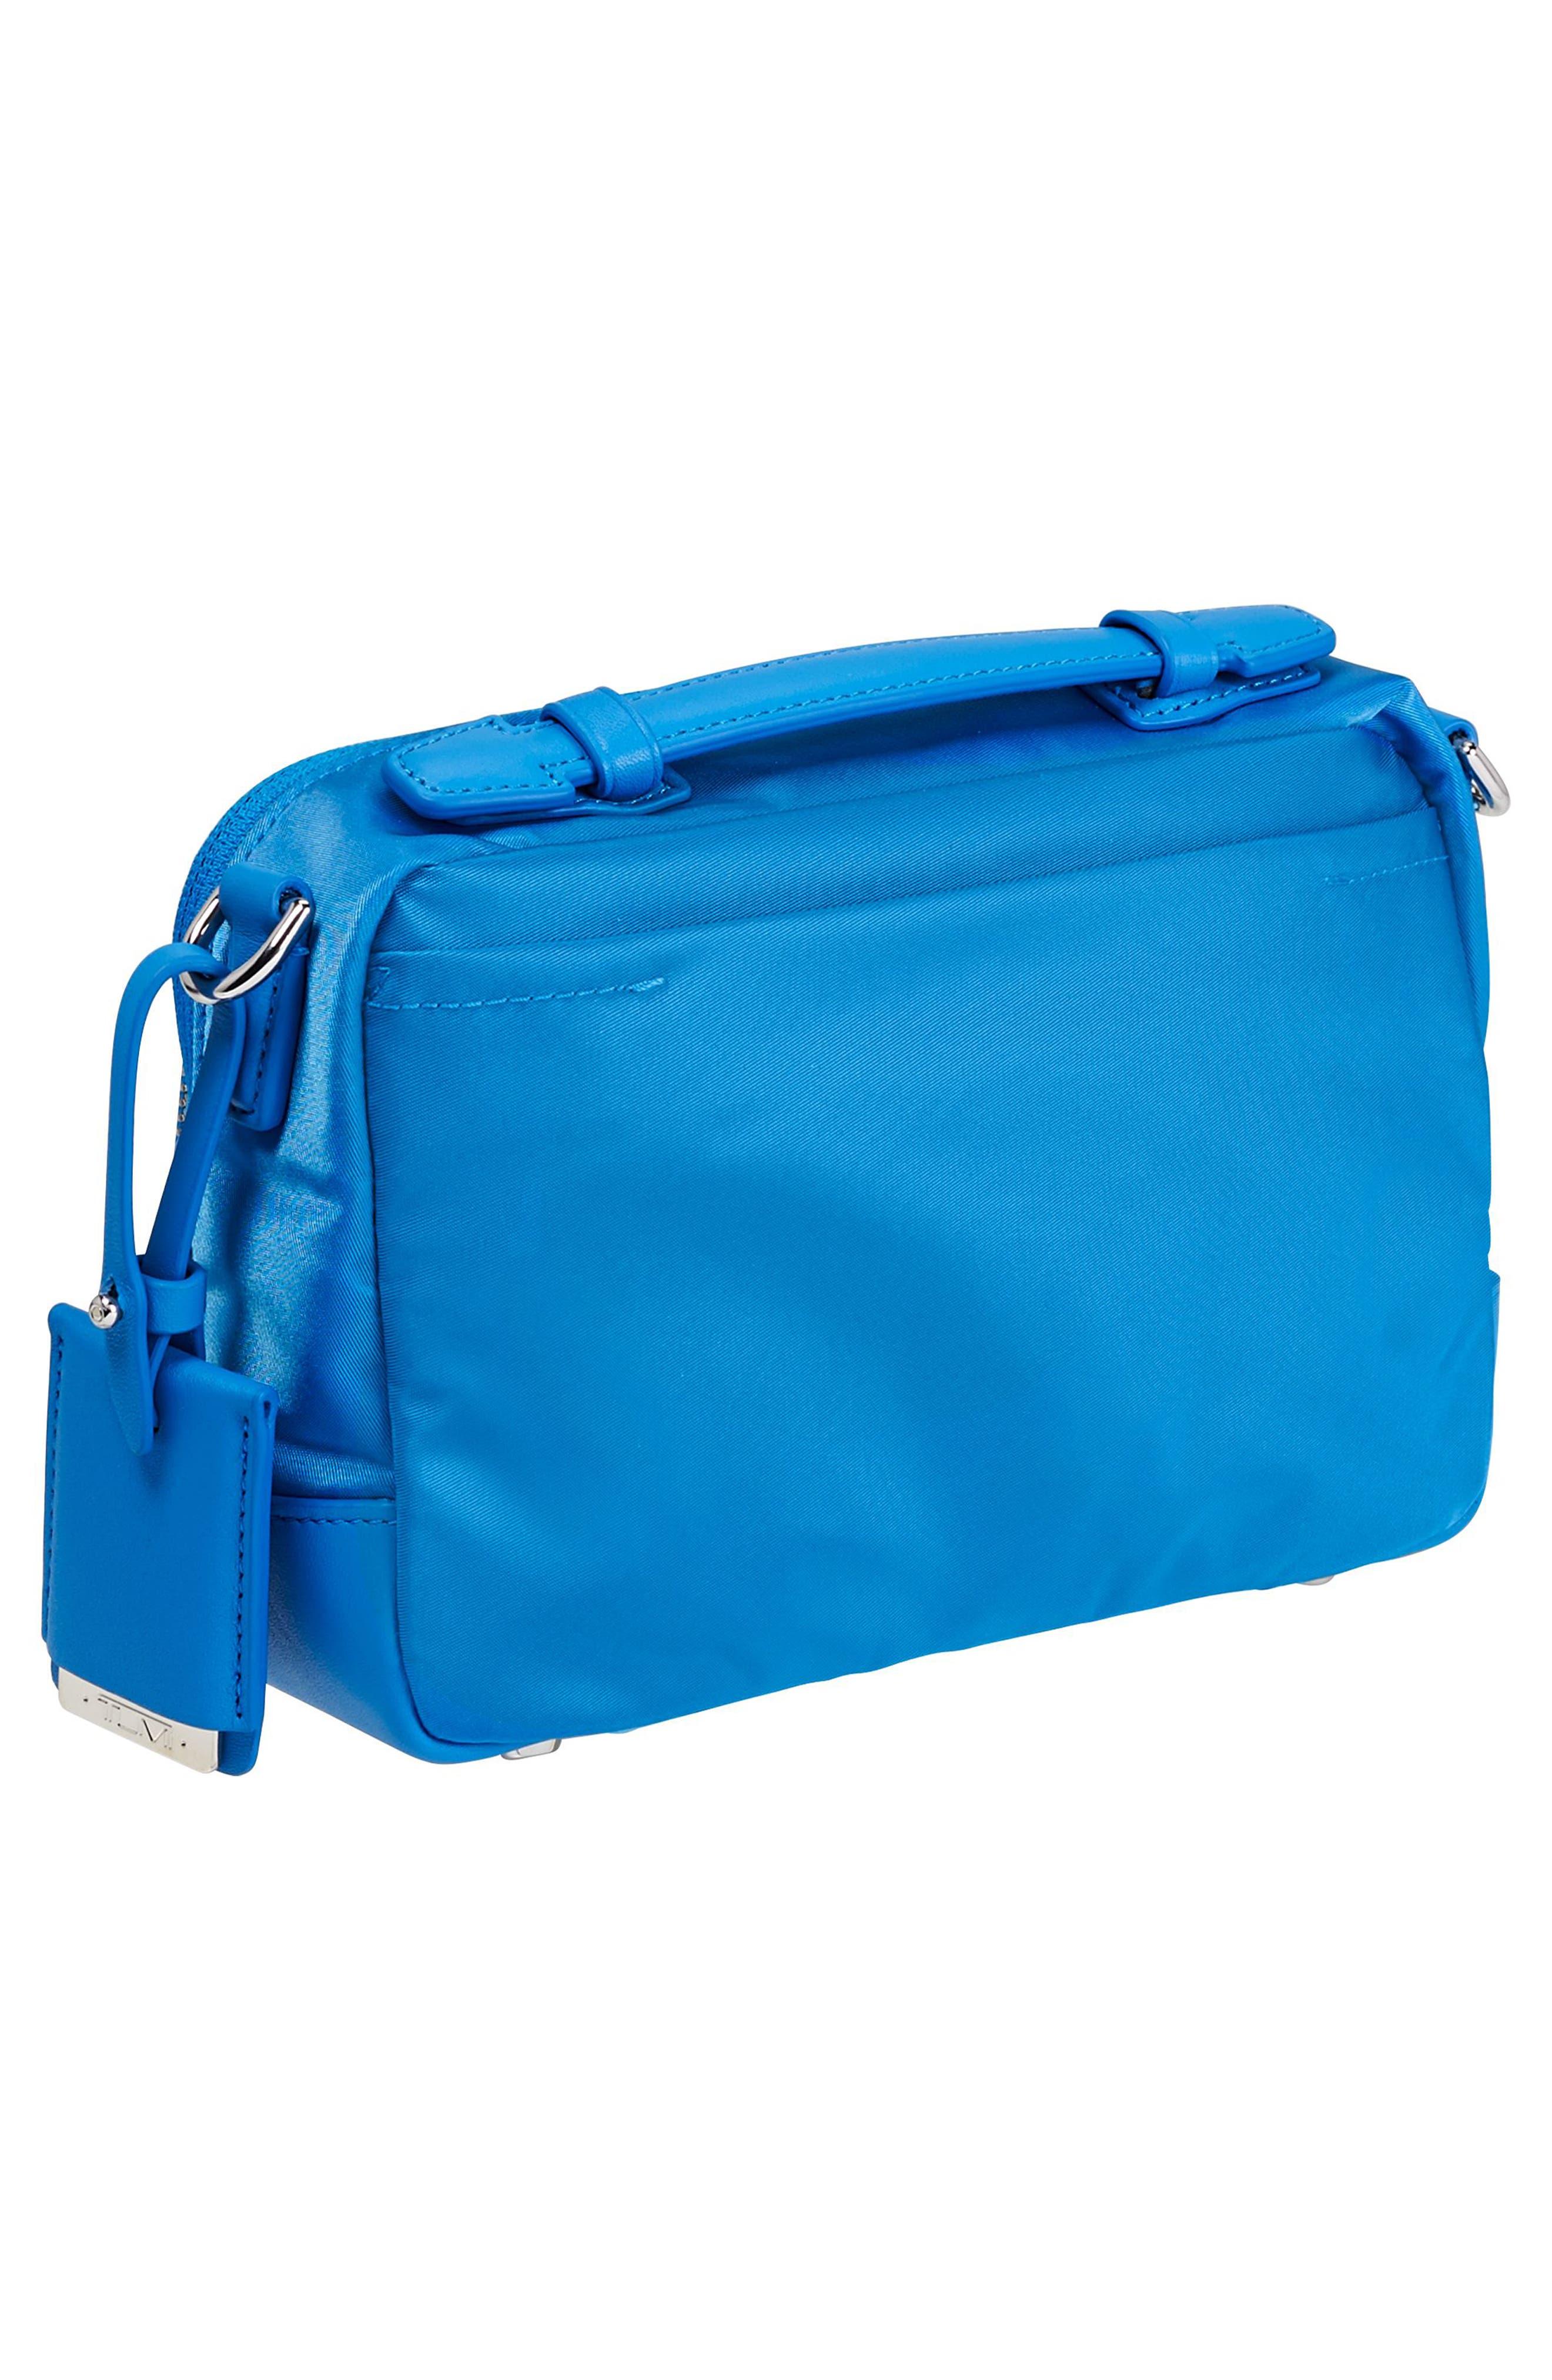 Luanda Crossbody Flight Bag,                             Alternate thumbnail 3, color,                             Bright Blue